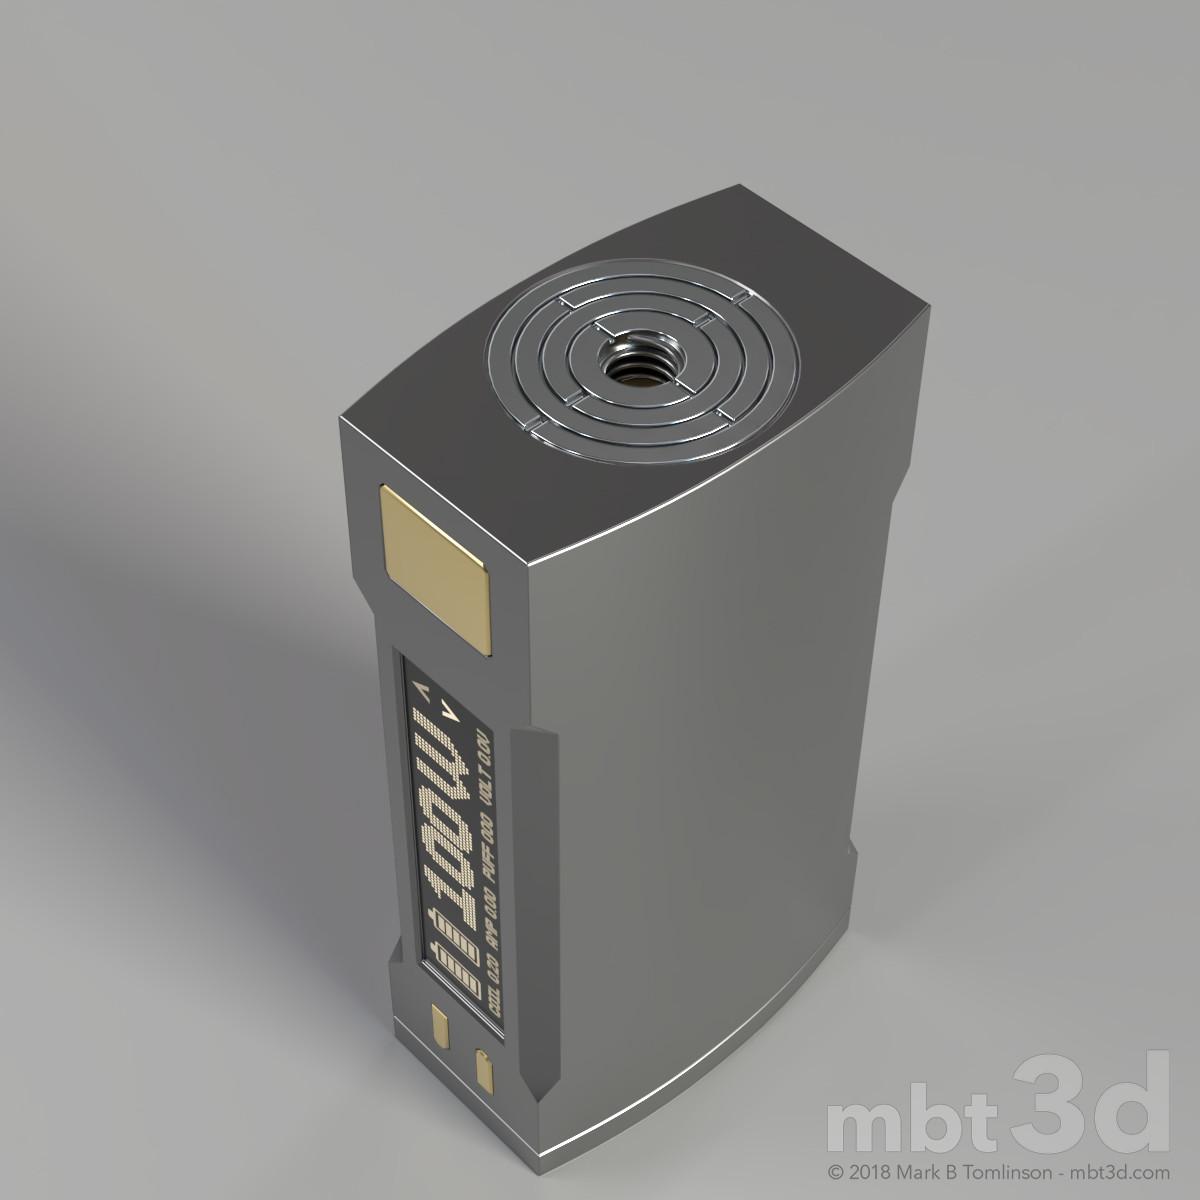 MODO Mod Box: Top 3/4